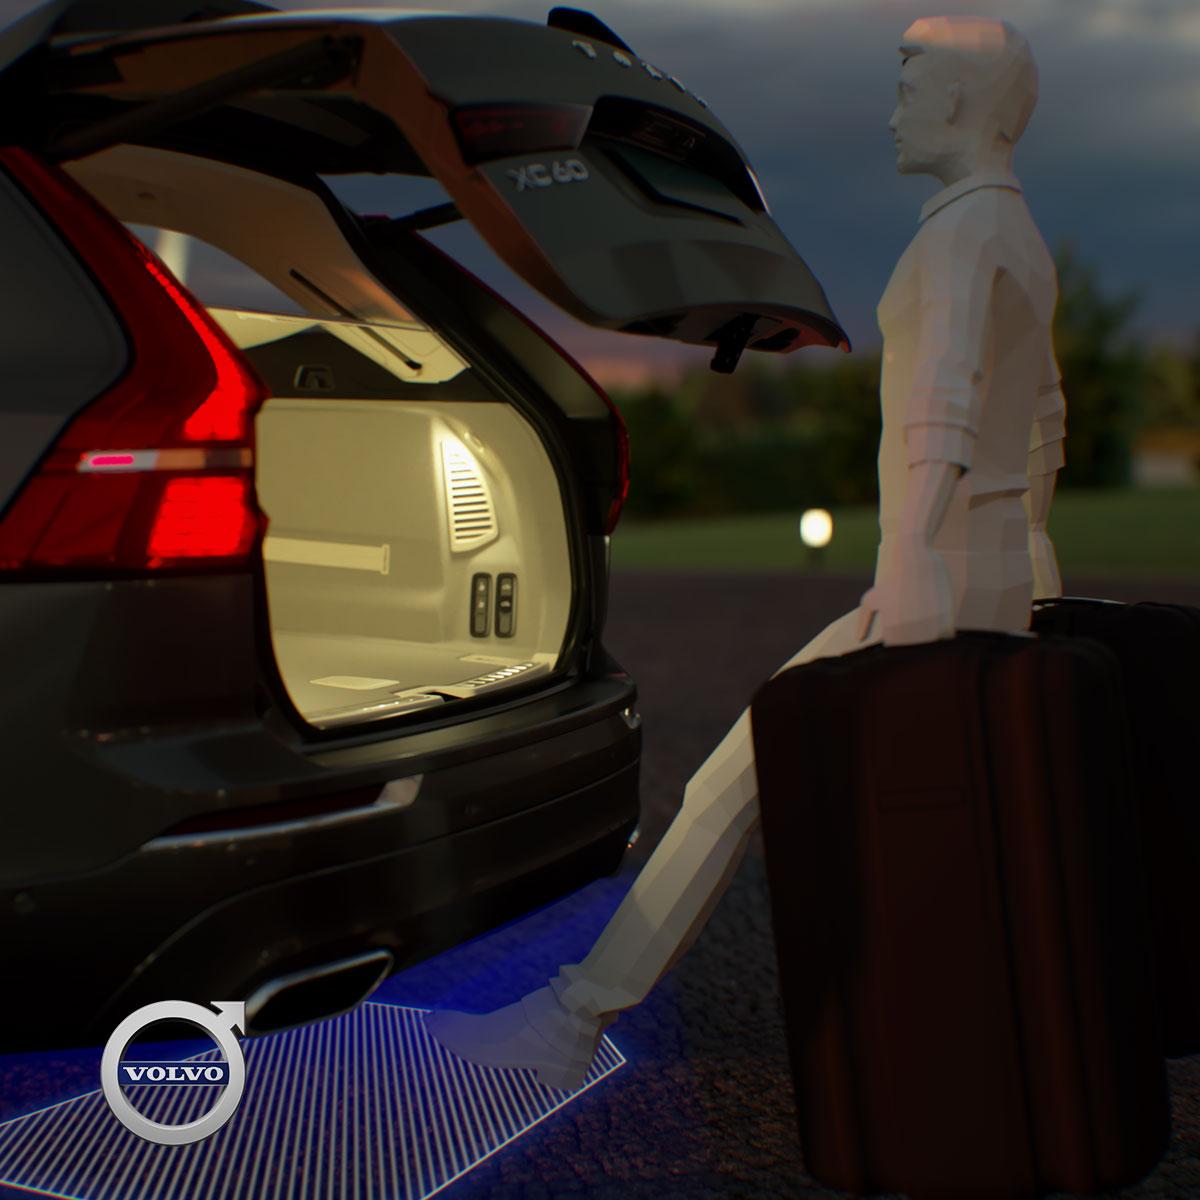 Volvo-Animations.jpg